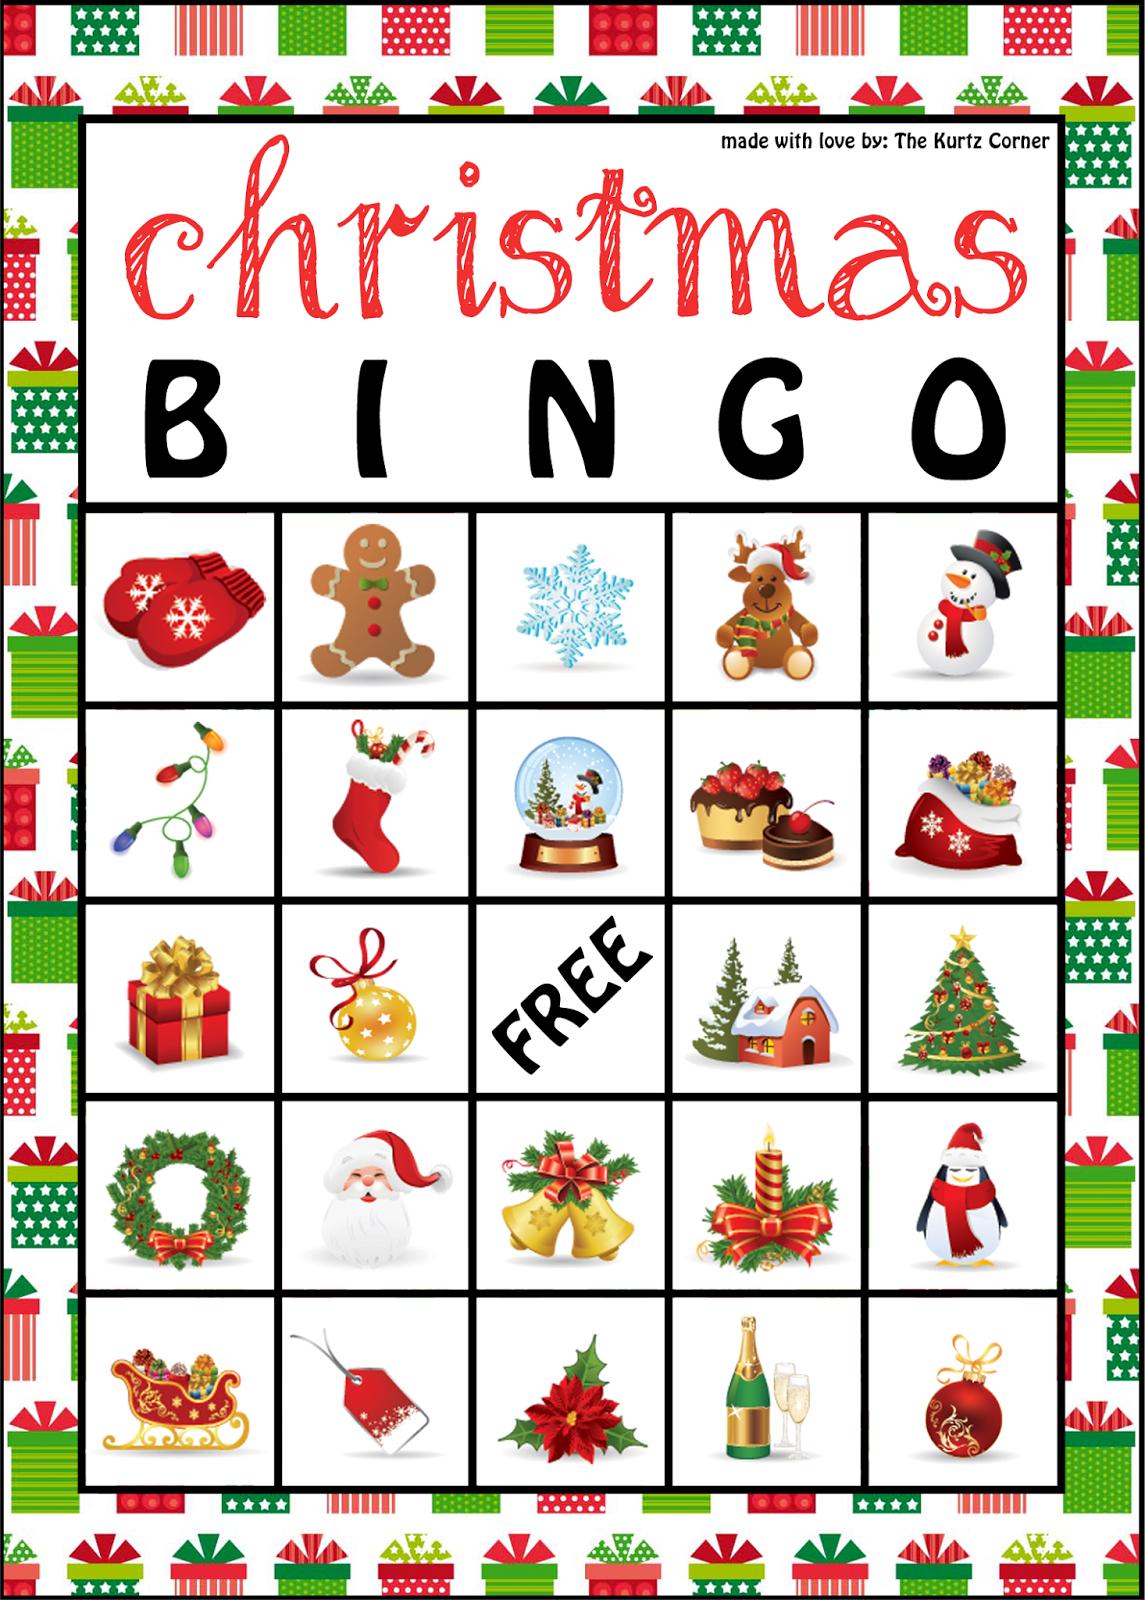 The Kurtz Corner: Free Printable Christmas Bingo Cards | Winter / X - Free Printable Christmas Bingo Cards